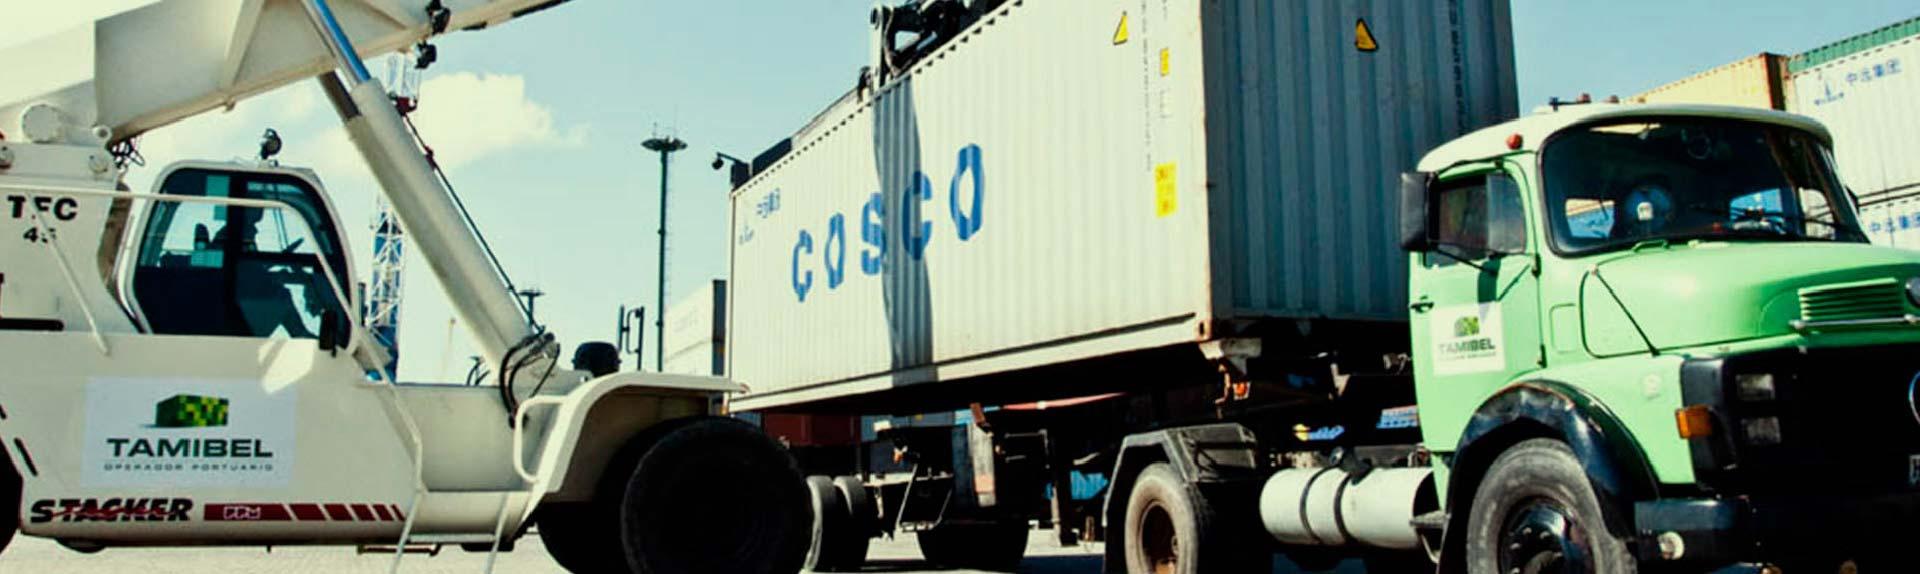 grúa cargando container en camión